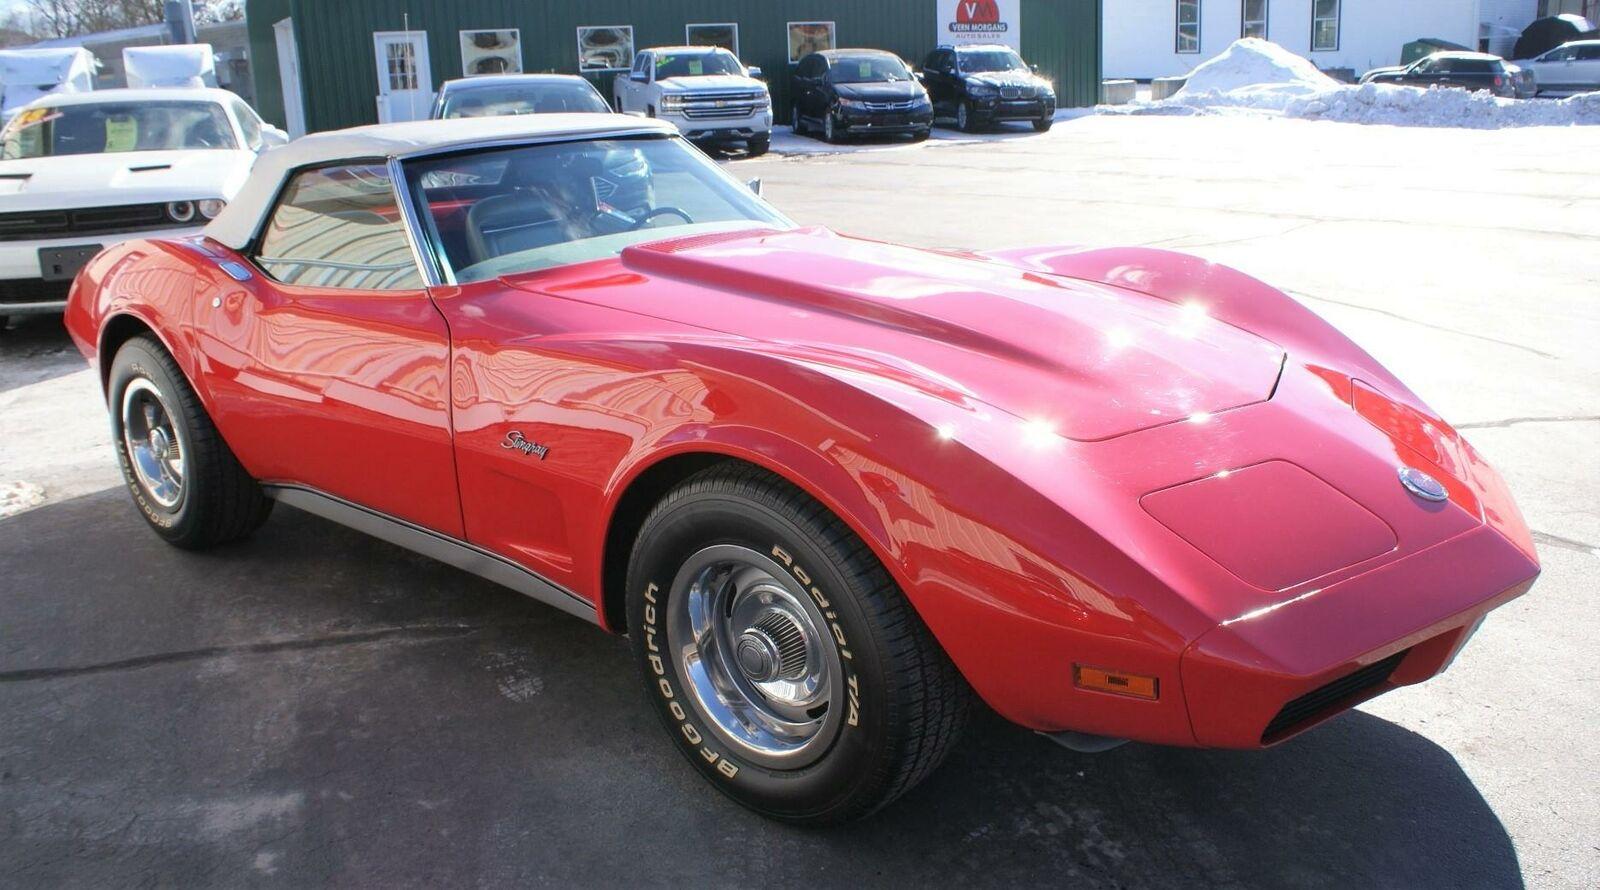 1974 Red Chevrolet Corvette  L82   C3 Corvette Photo 7